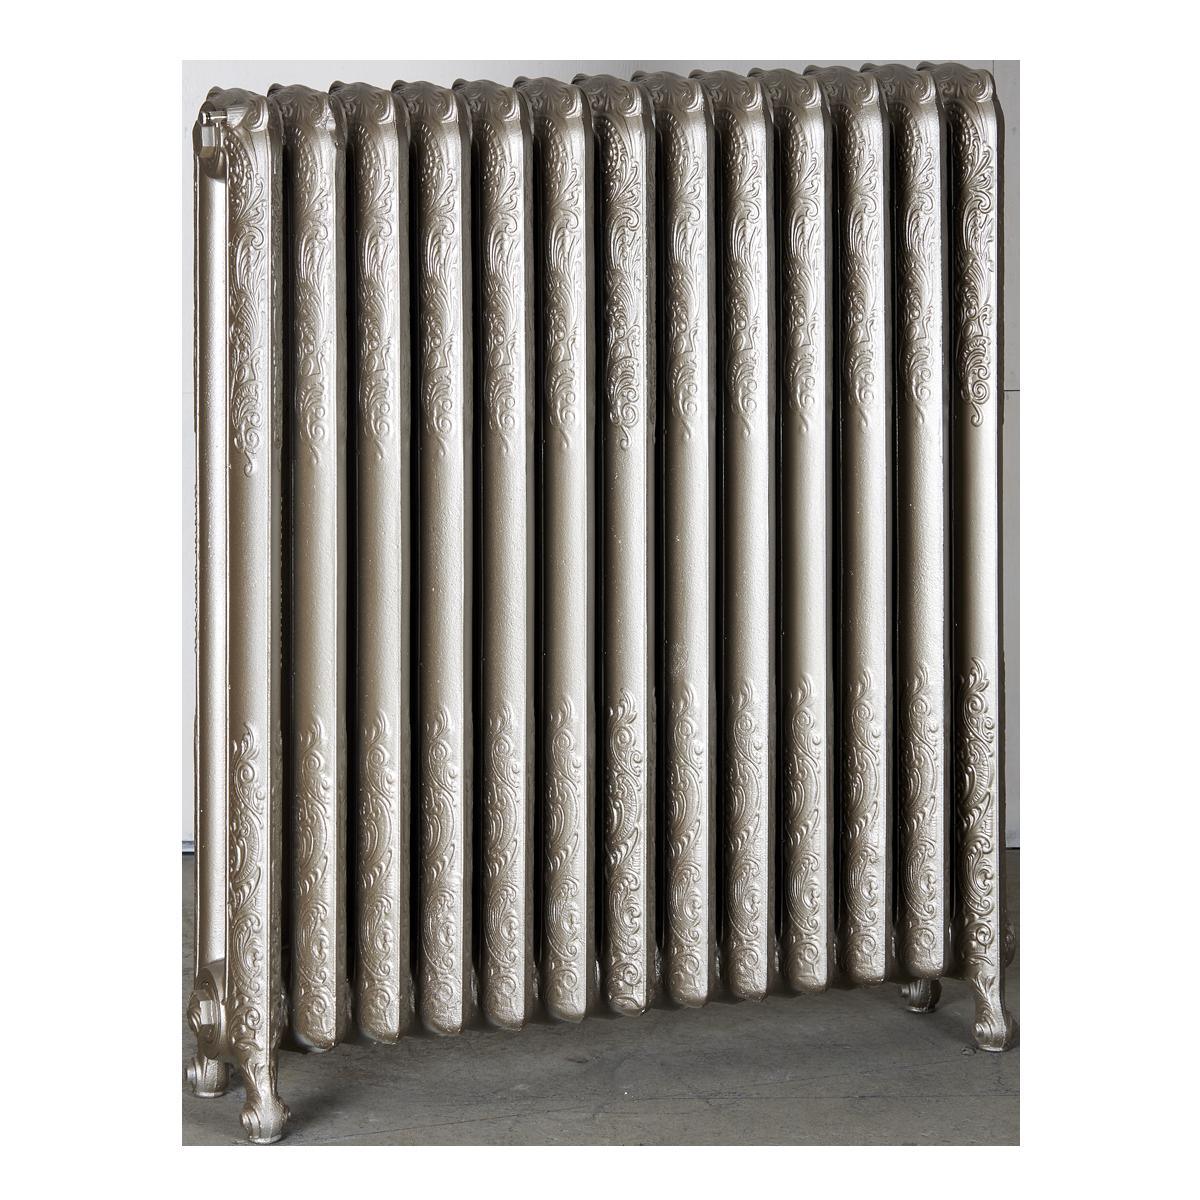 Ironworks Radiators Inc. refurbished cast iron radiator Danforth in Nickel metallic